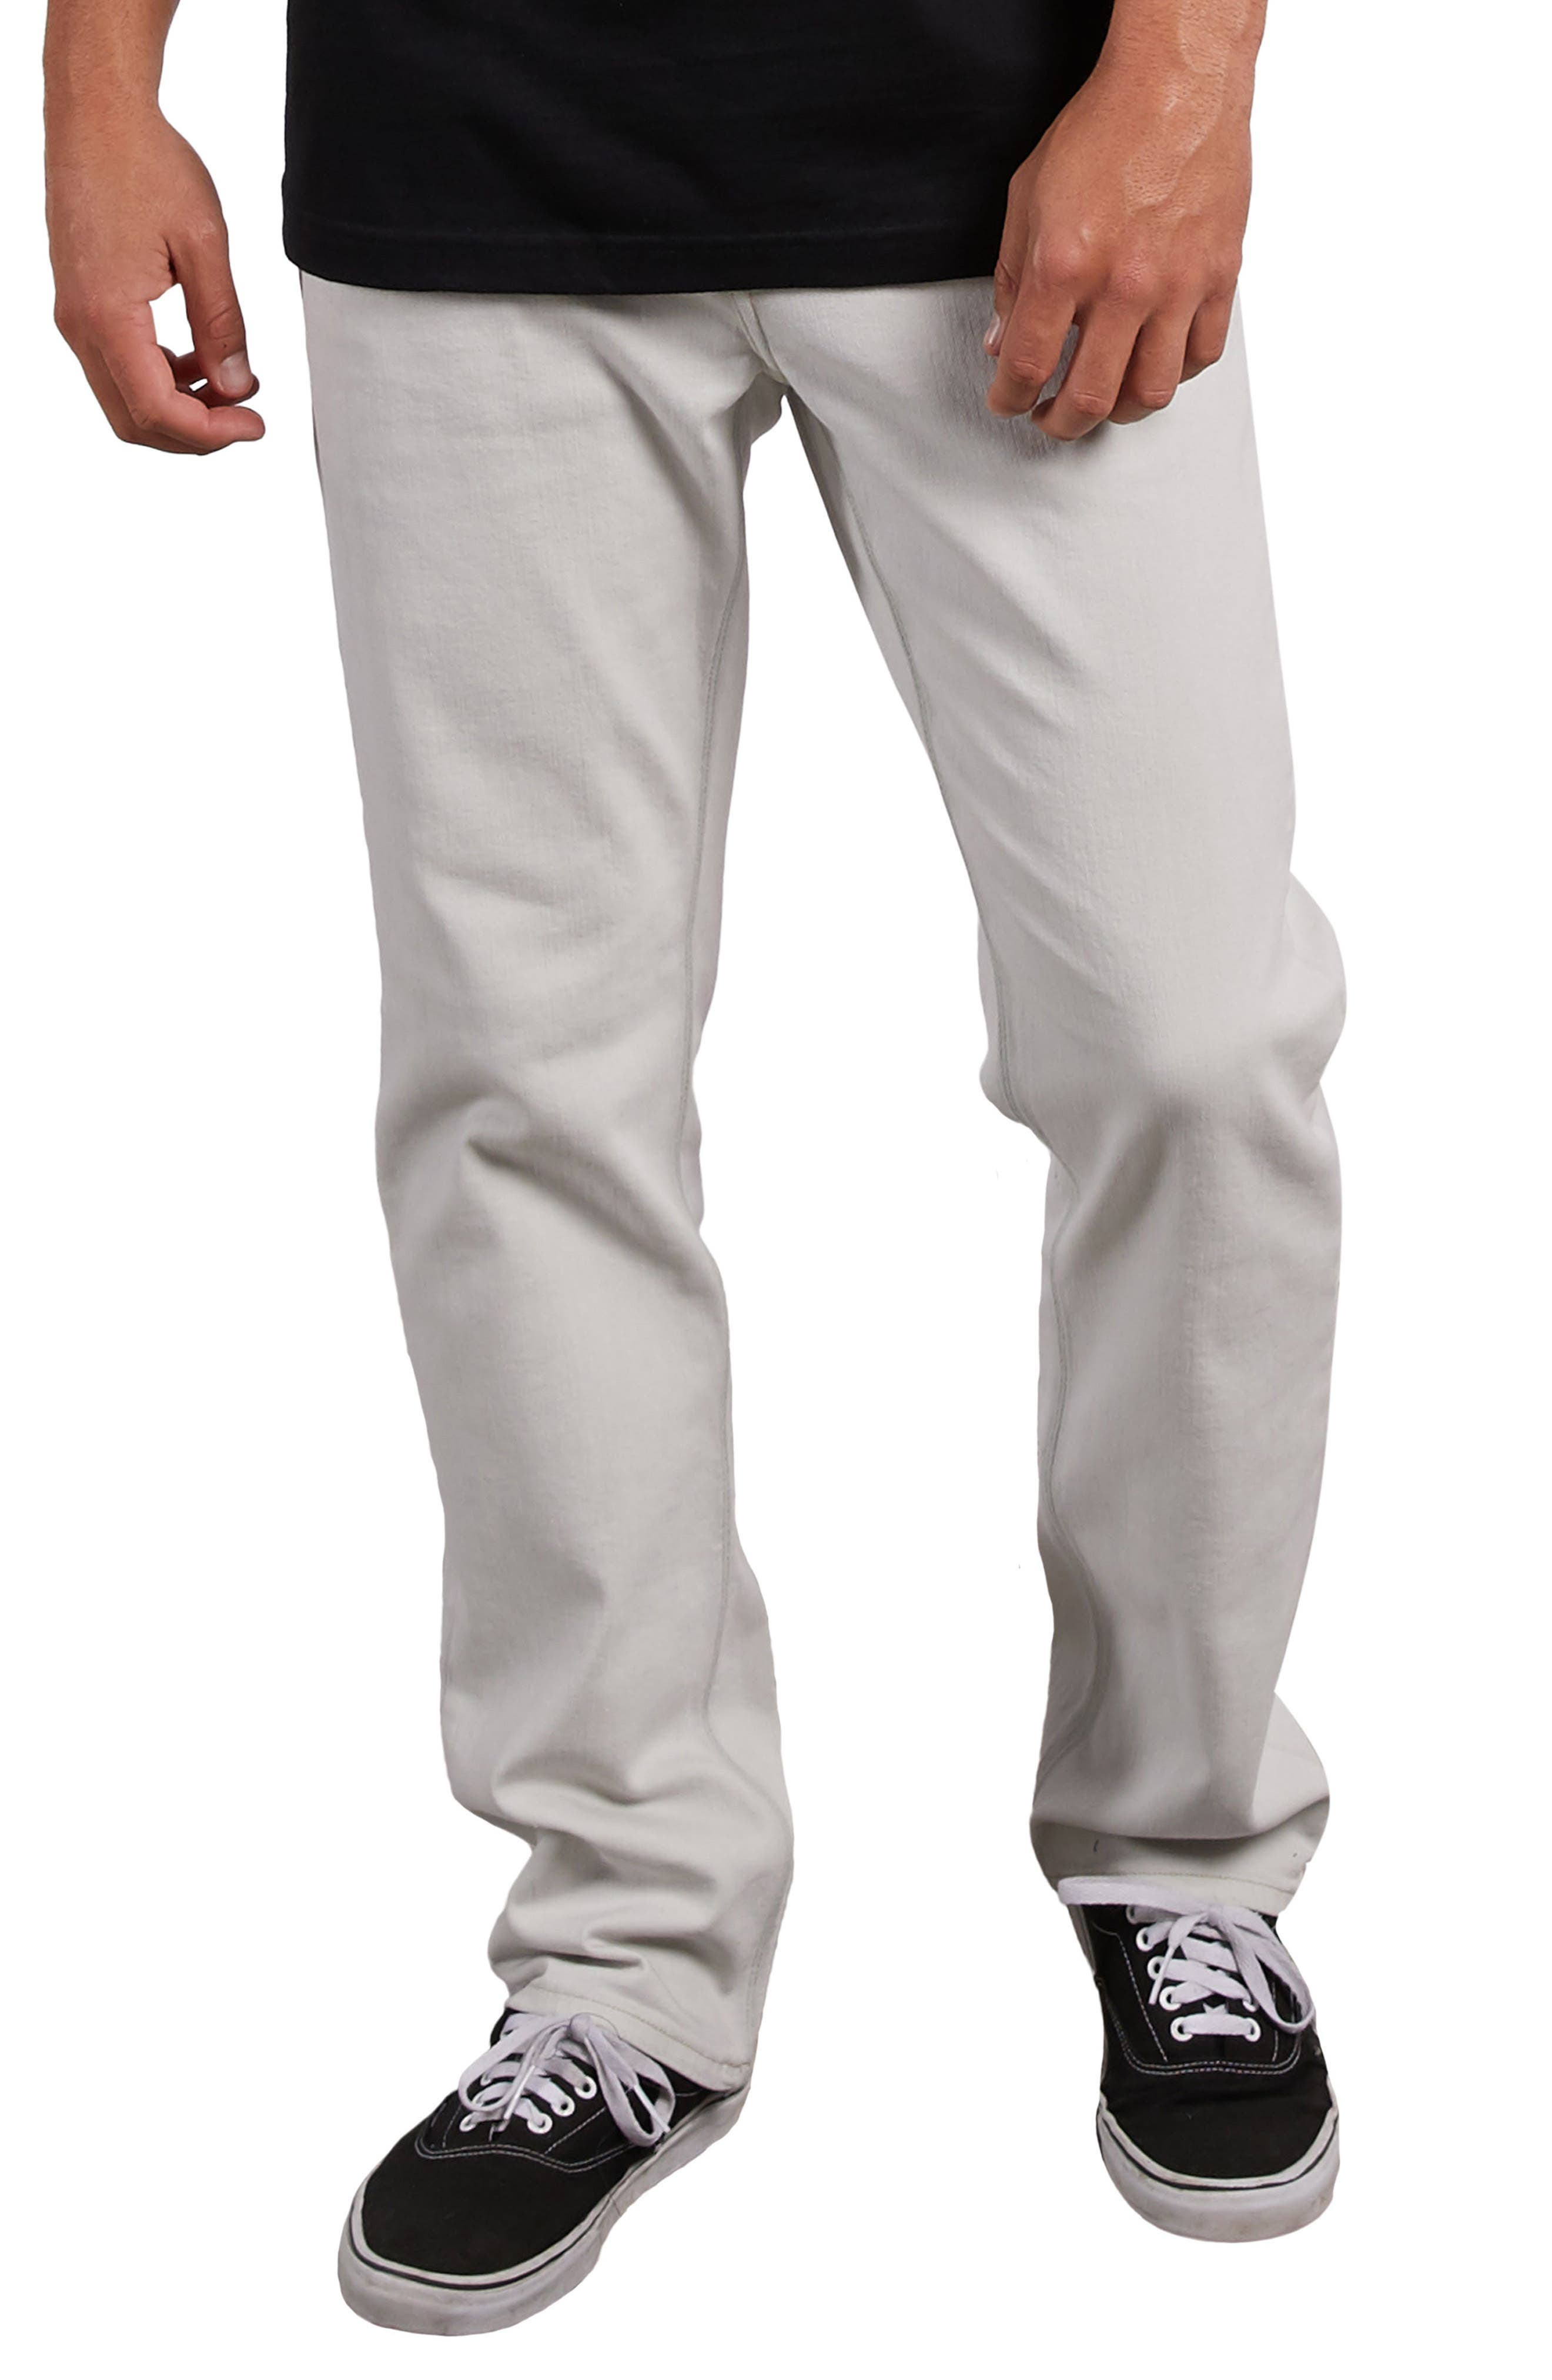 Solver Denim Pants,                             Main thumbnail 1, color,                             DIRTY WHITE